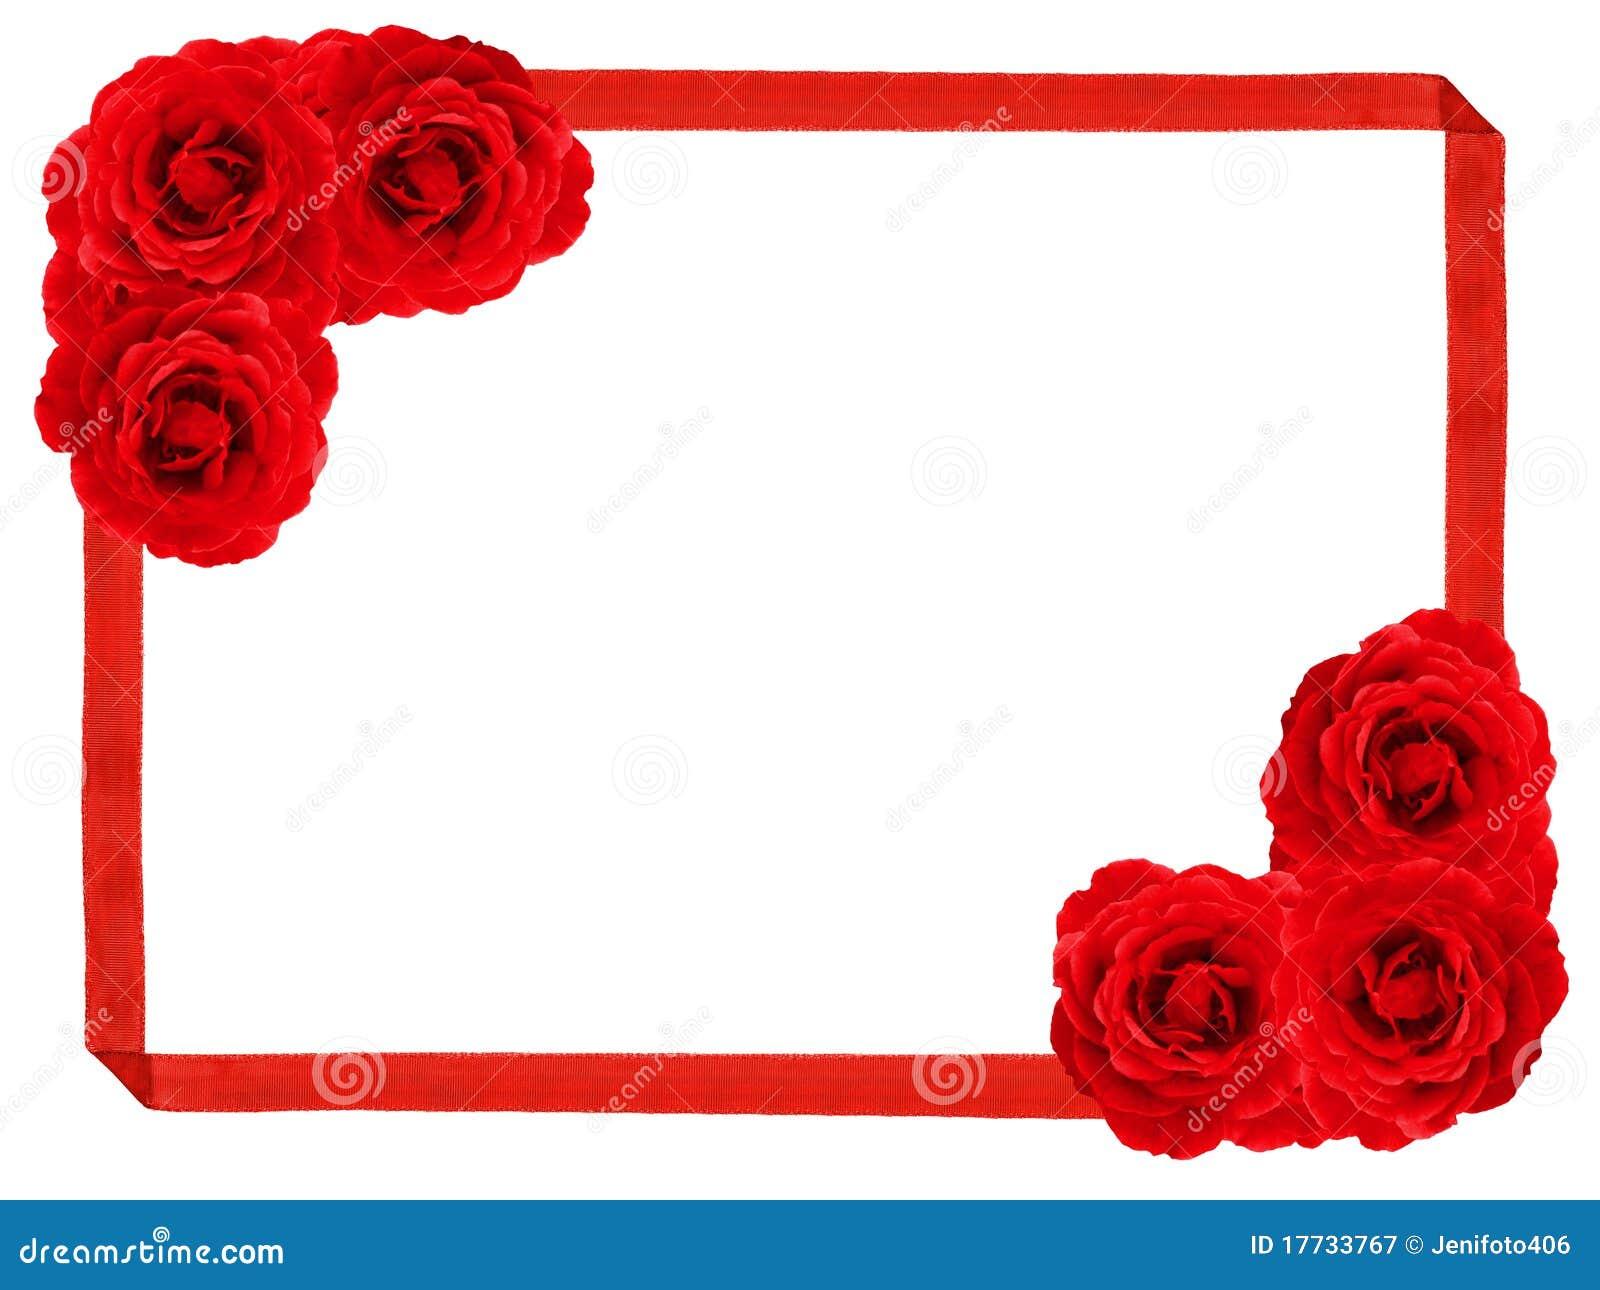 Rose frame stock image. Image of engagement, copy, floral - 17733767